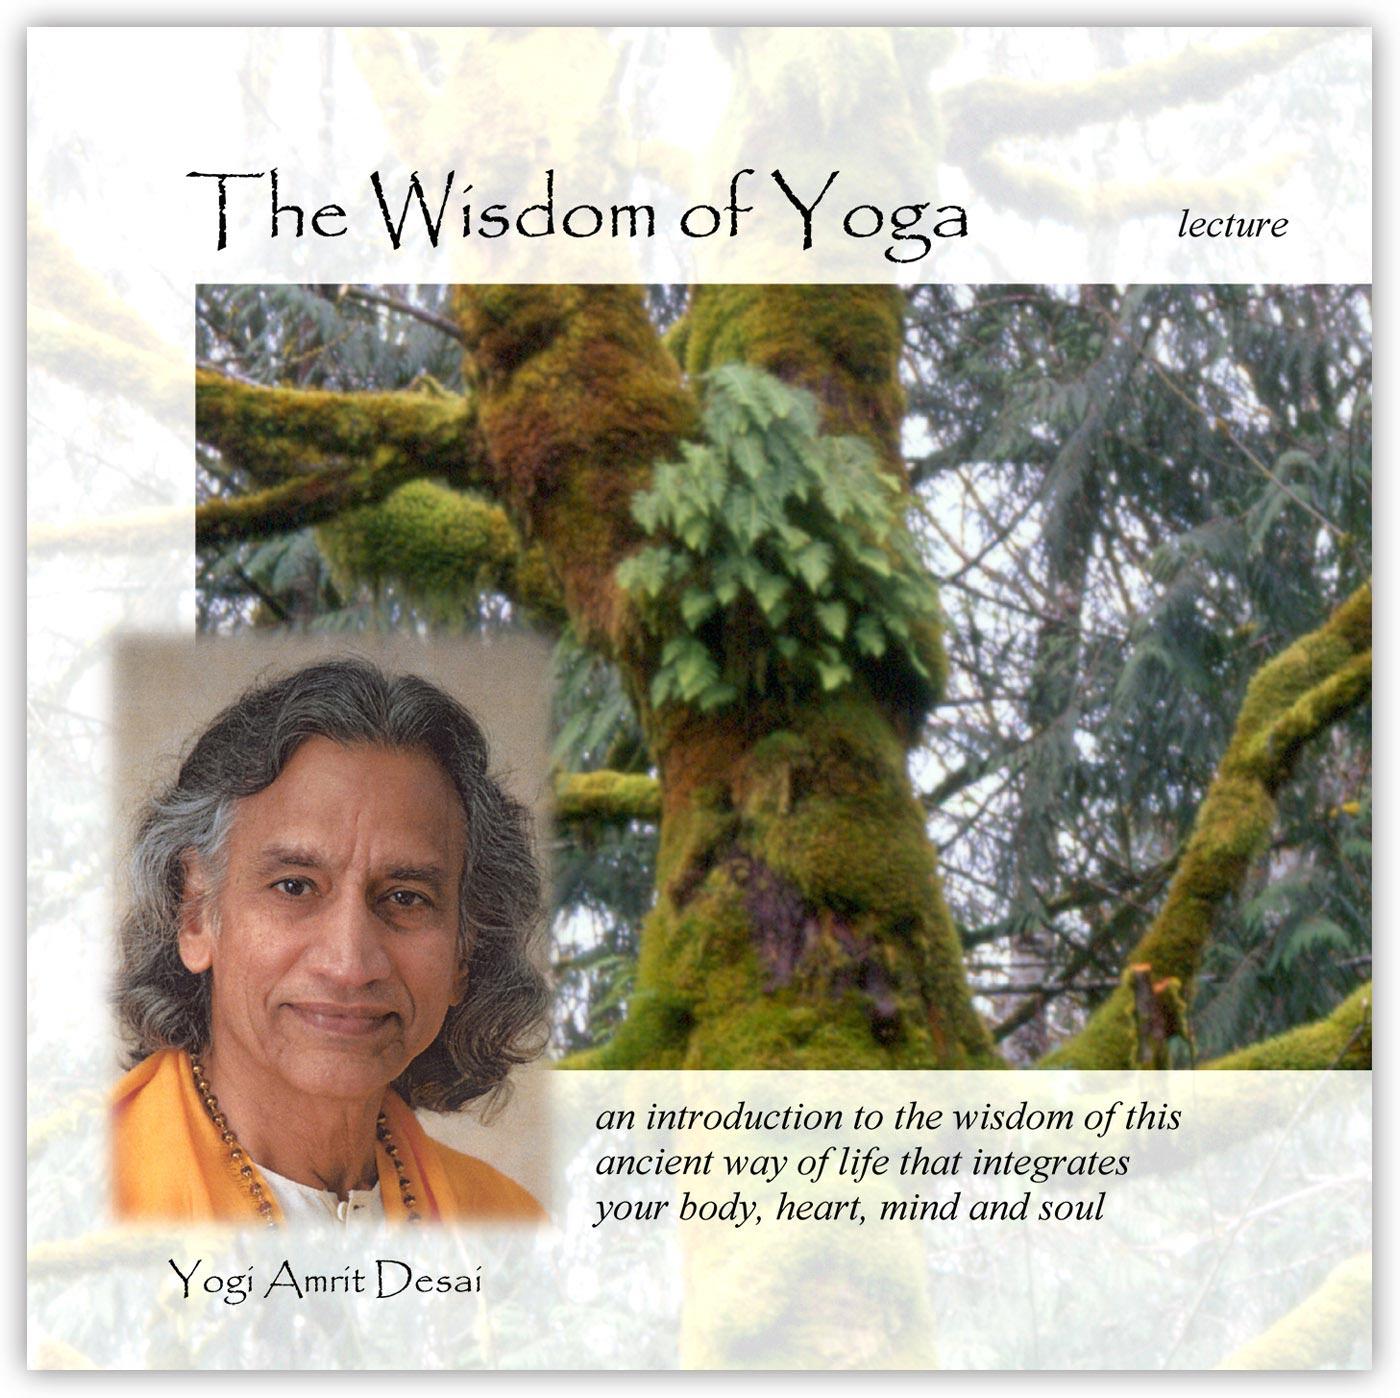 Lecture – The Wisdom of Yoga with Yogi Amrit Desai